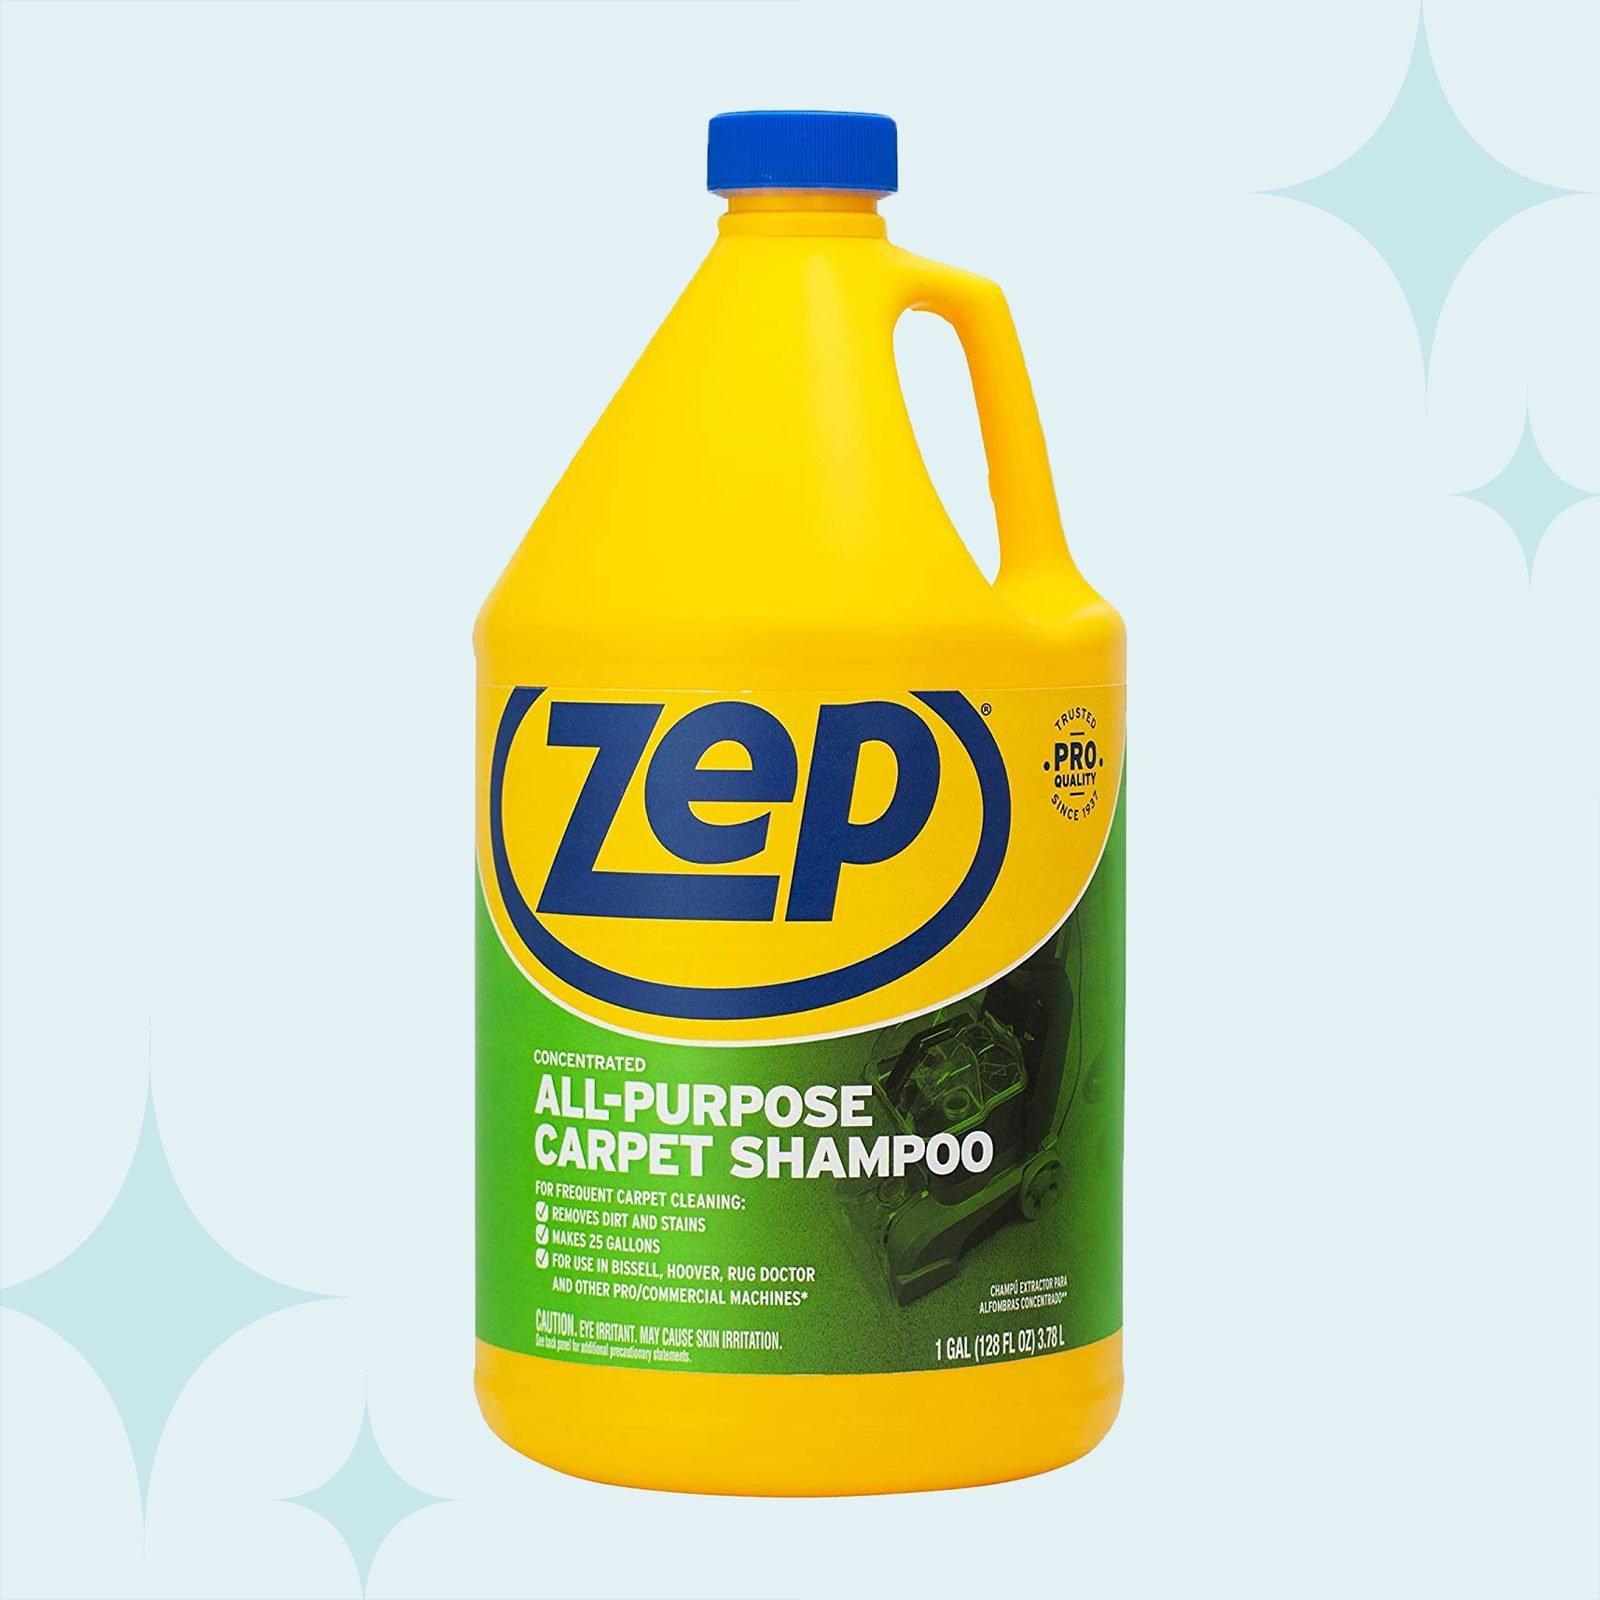 Zep All-Purpose Carpet Shampoo Concentrate